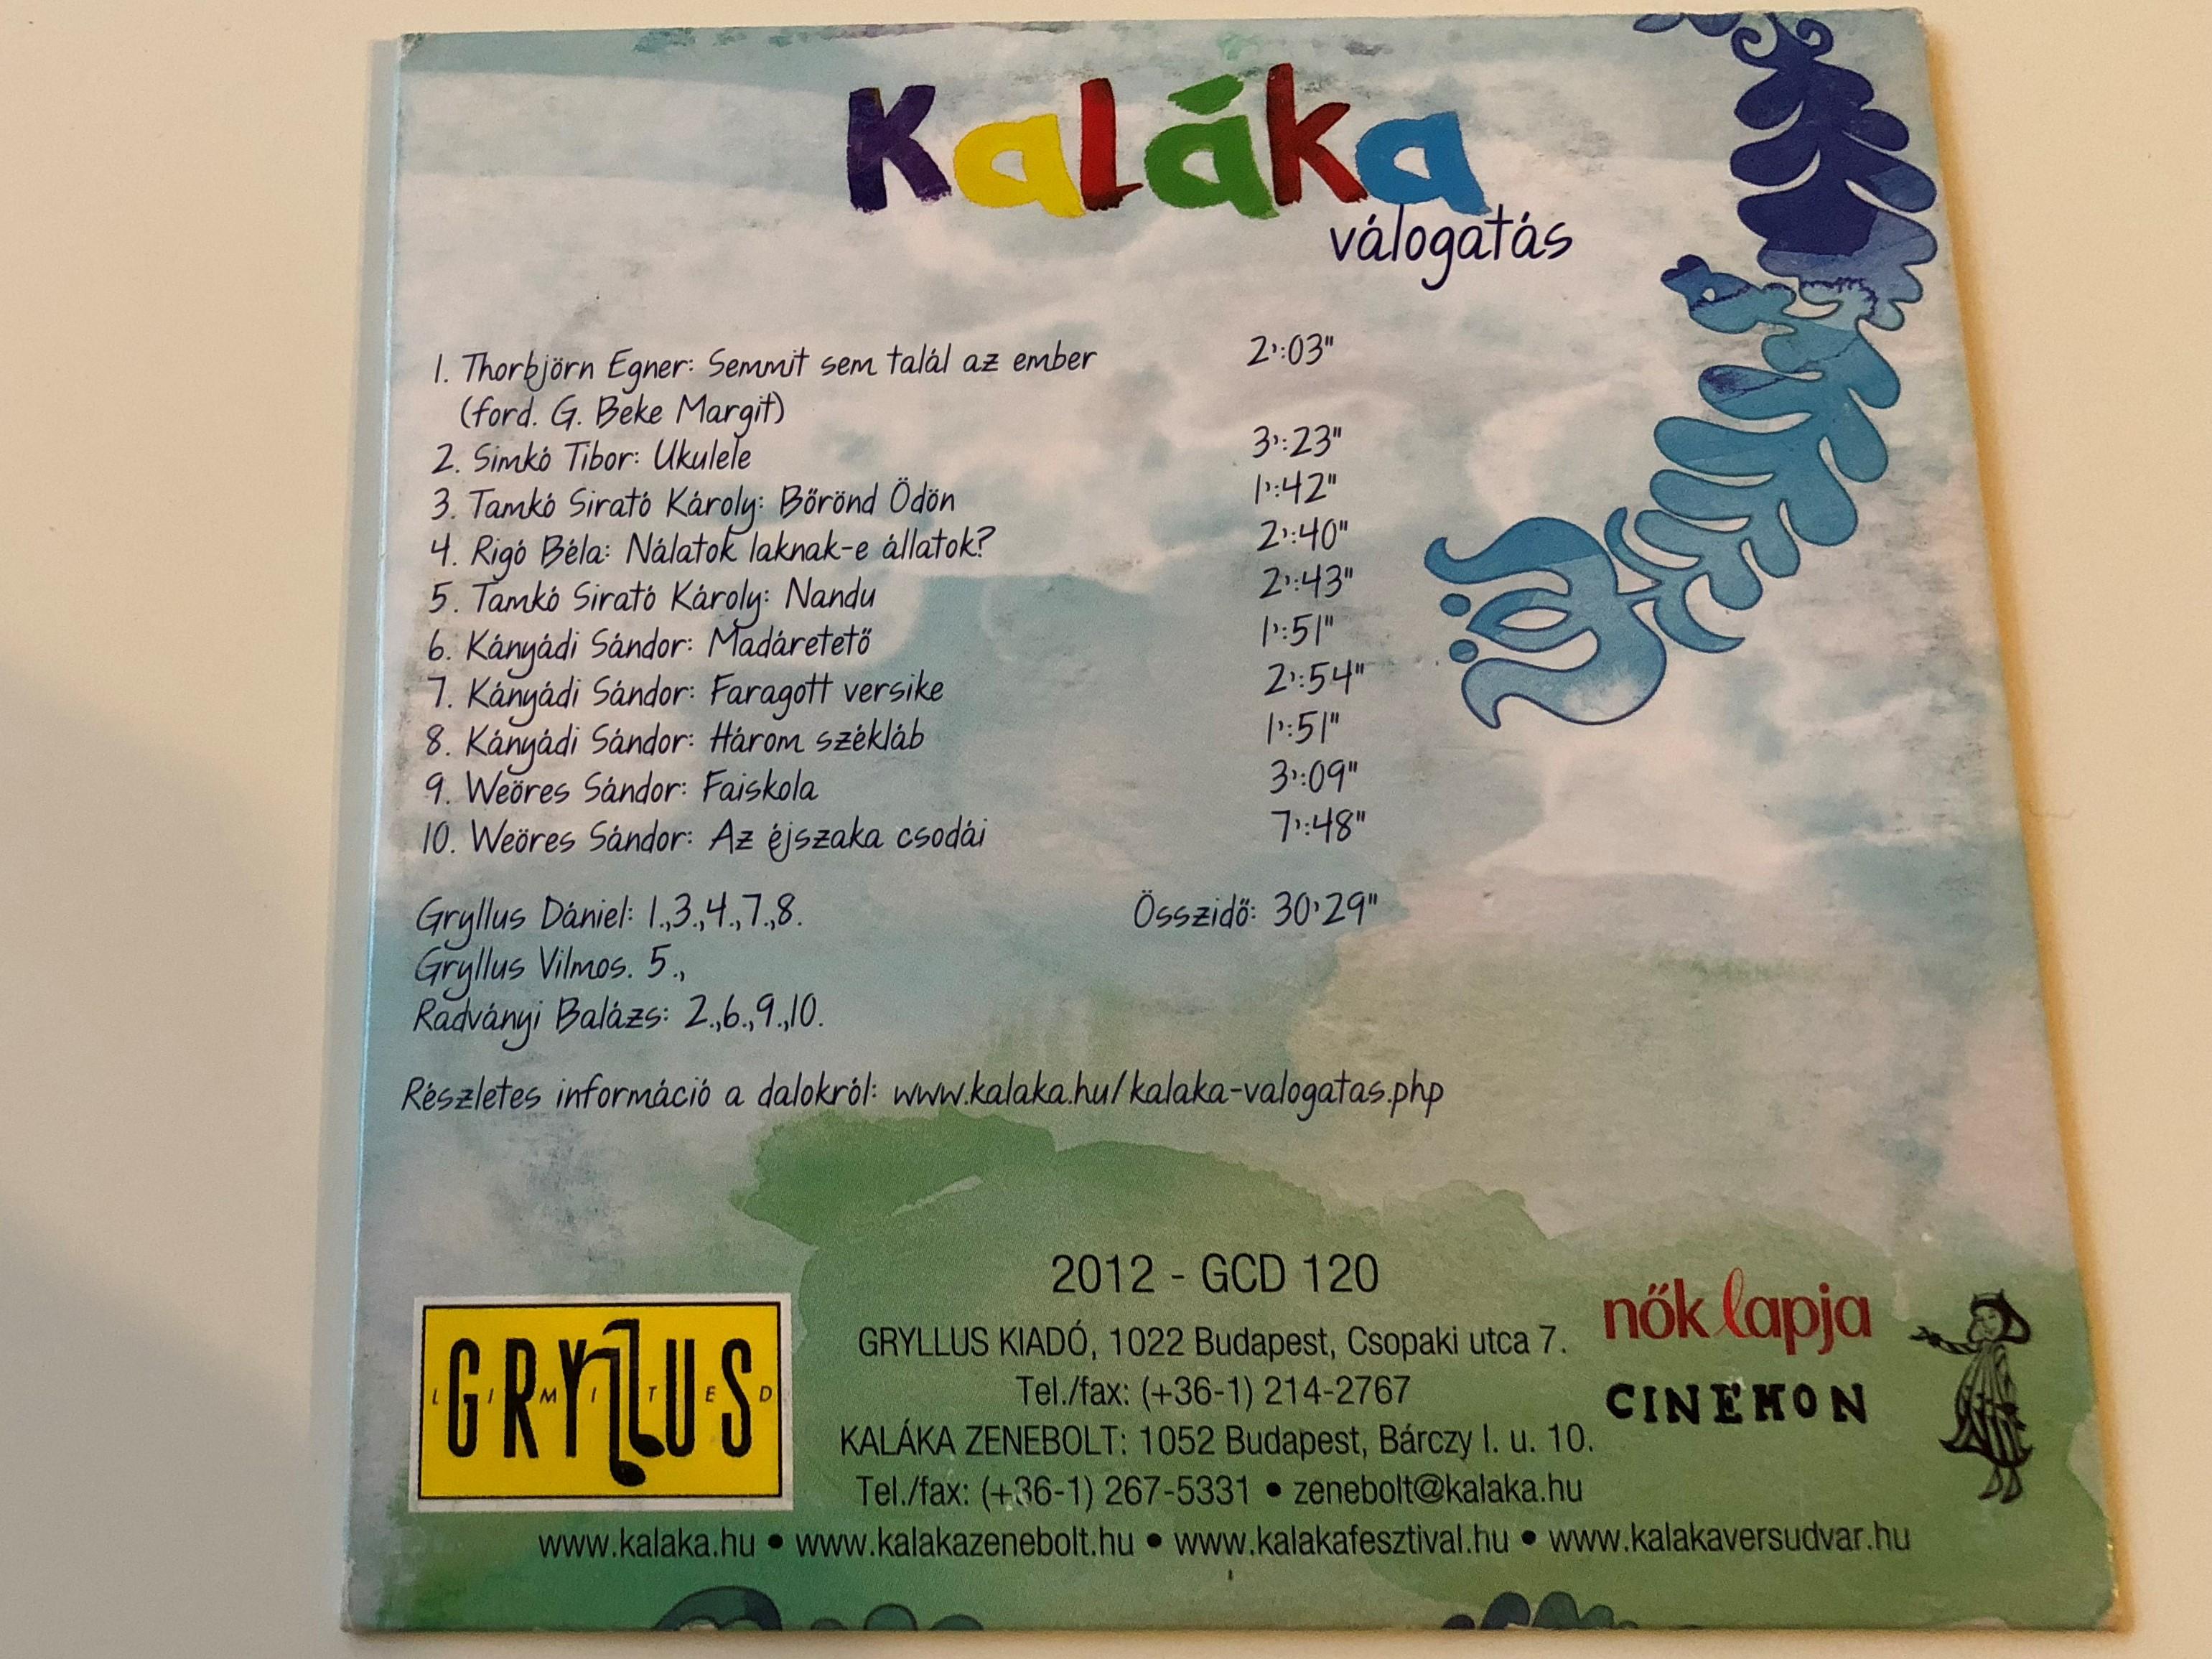 a-nok-lapja-bemutatja-kalaka-valogatas-nalatok-laknak-e-allatok-nandu-fakatona-borond-odon-madareteto-faiskola-ukulele-gryllus-kiado-audio-cd-2012-gcd-120-2-.jpg